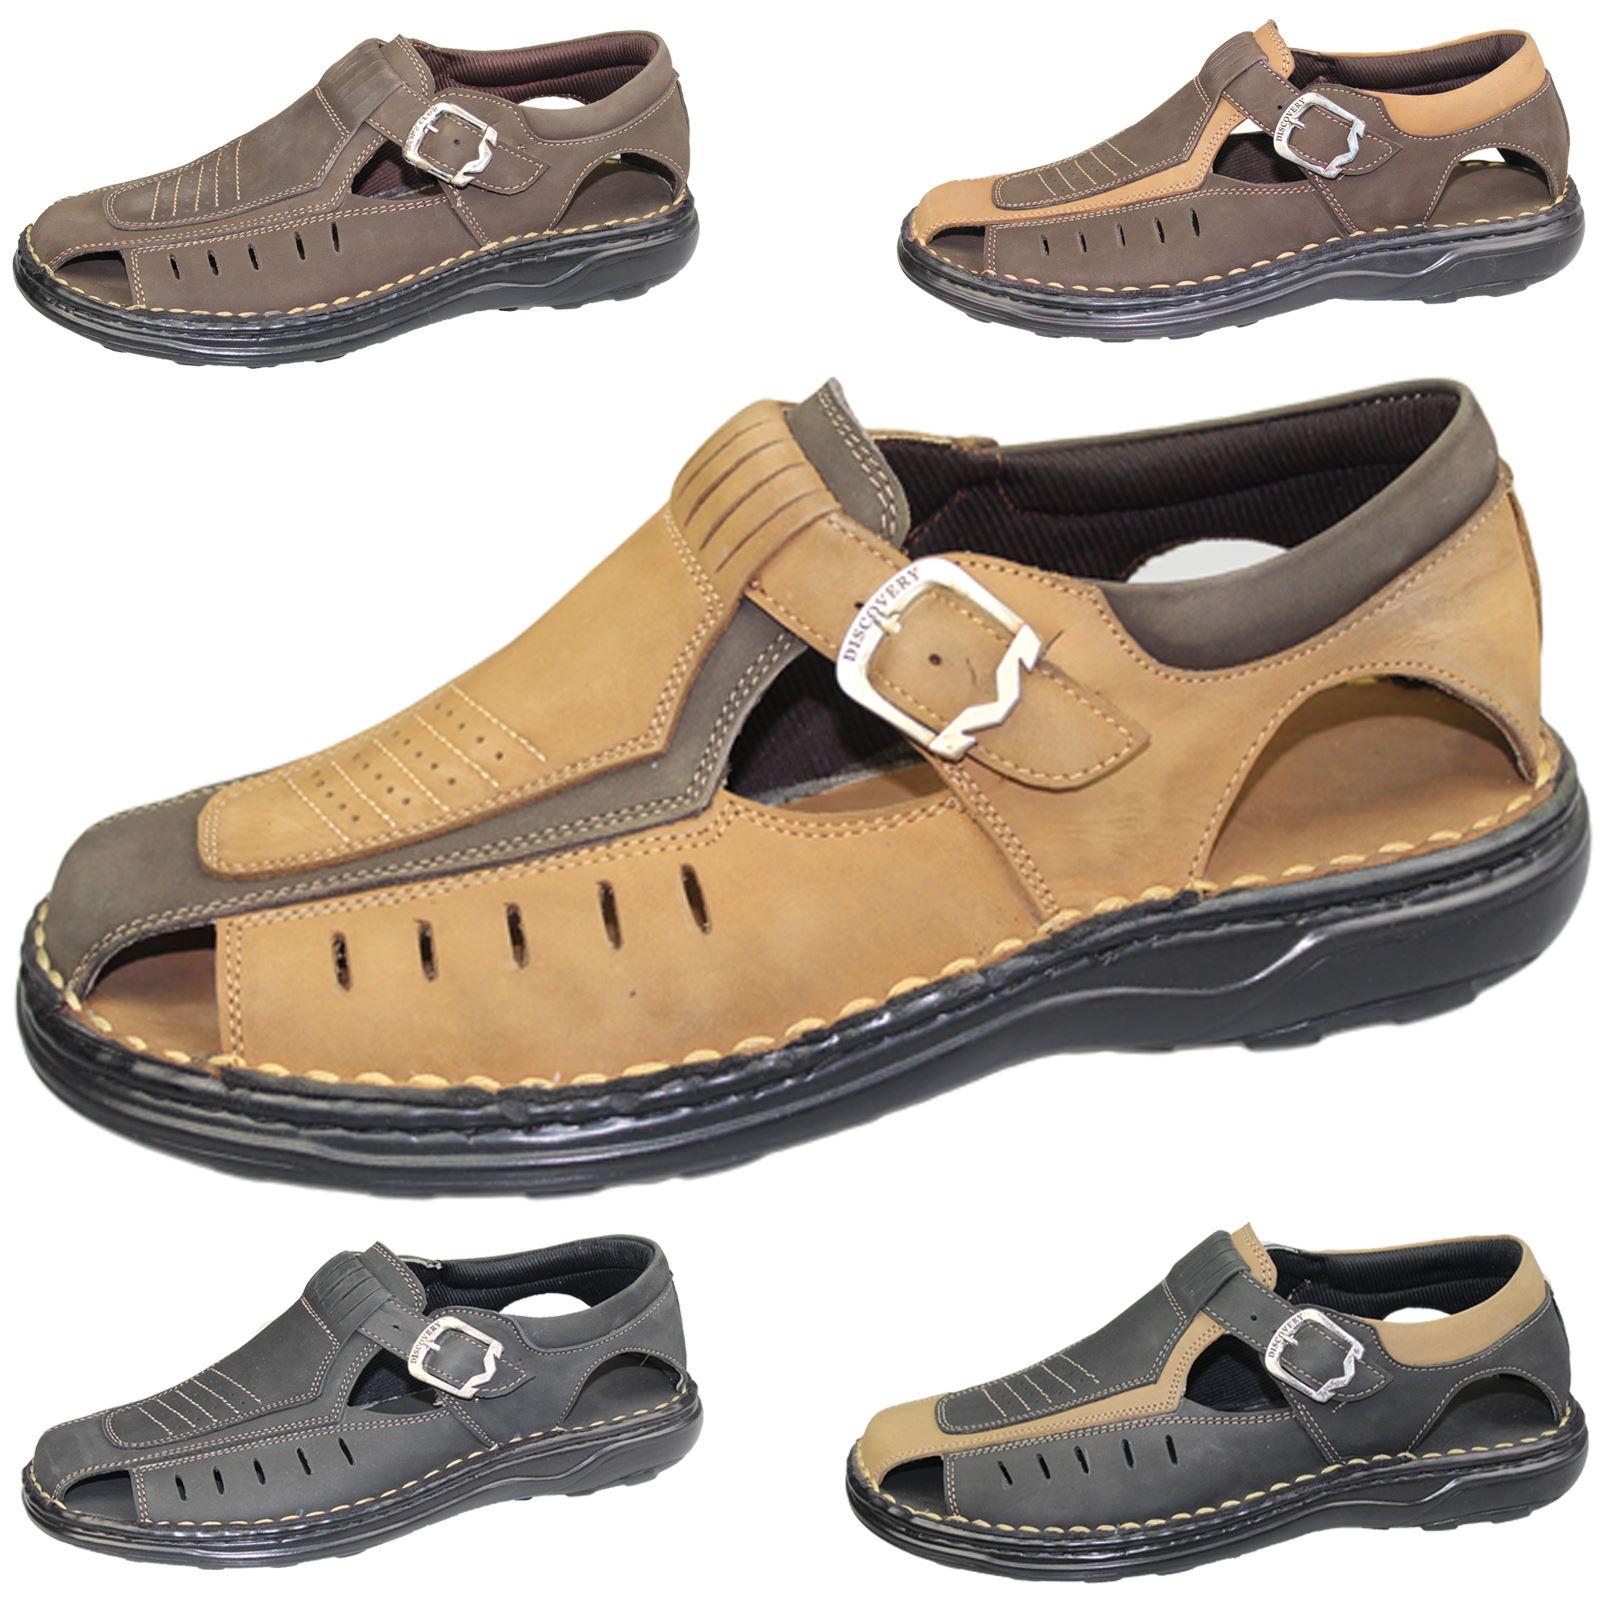 Mens-Buckle-Fastening-Sandals-Flat-Beach-Walking-Fashion-Casual-Summer-Slipper miniatura 14